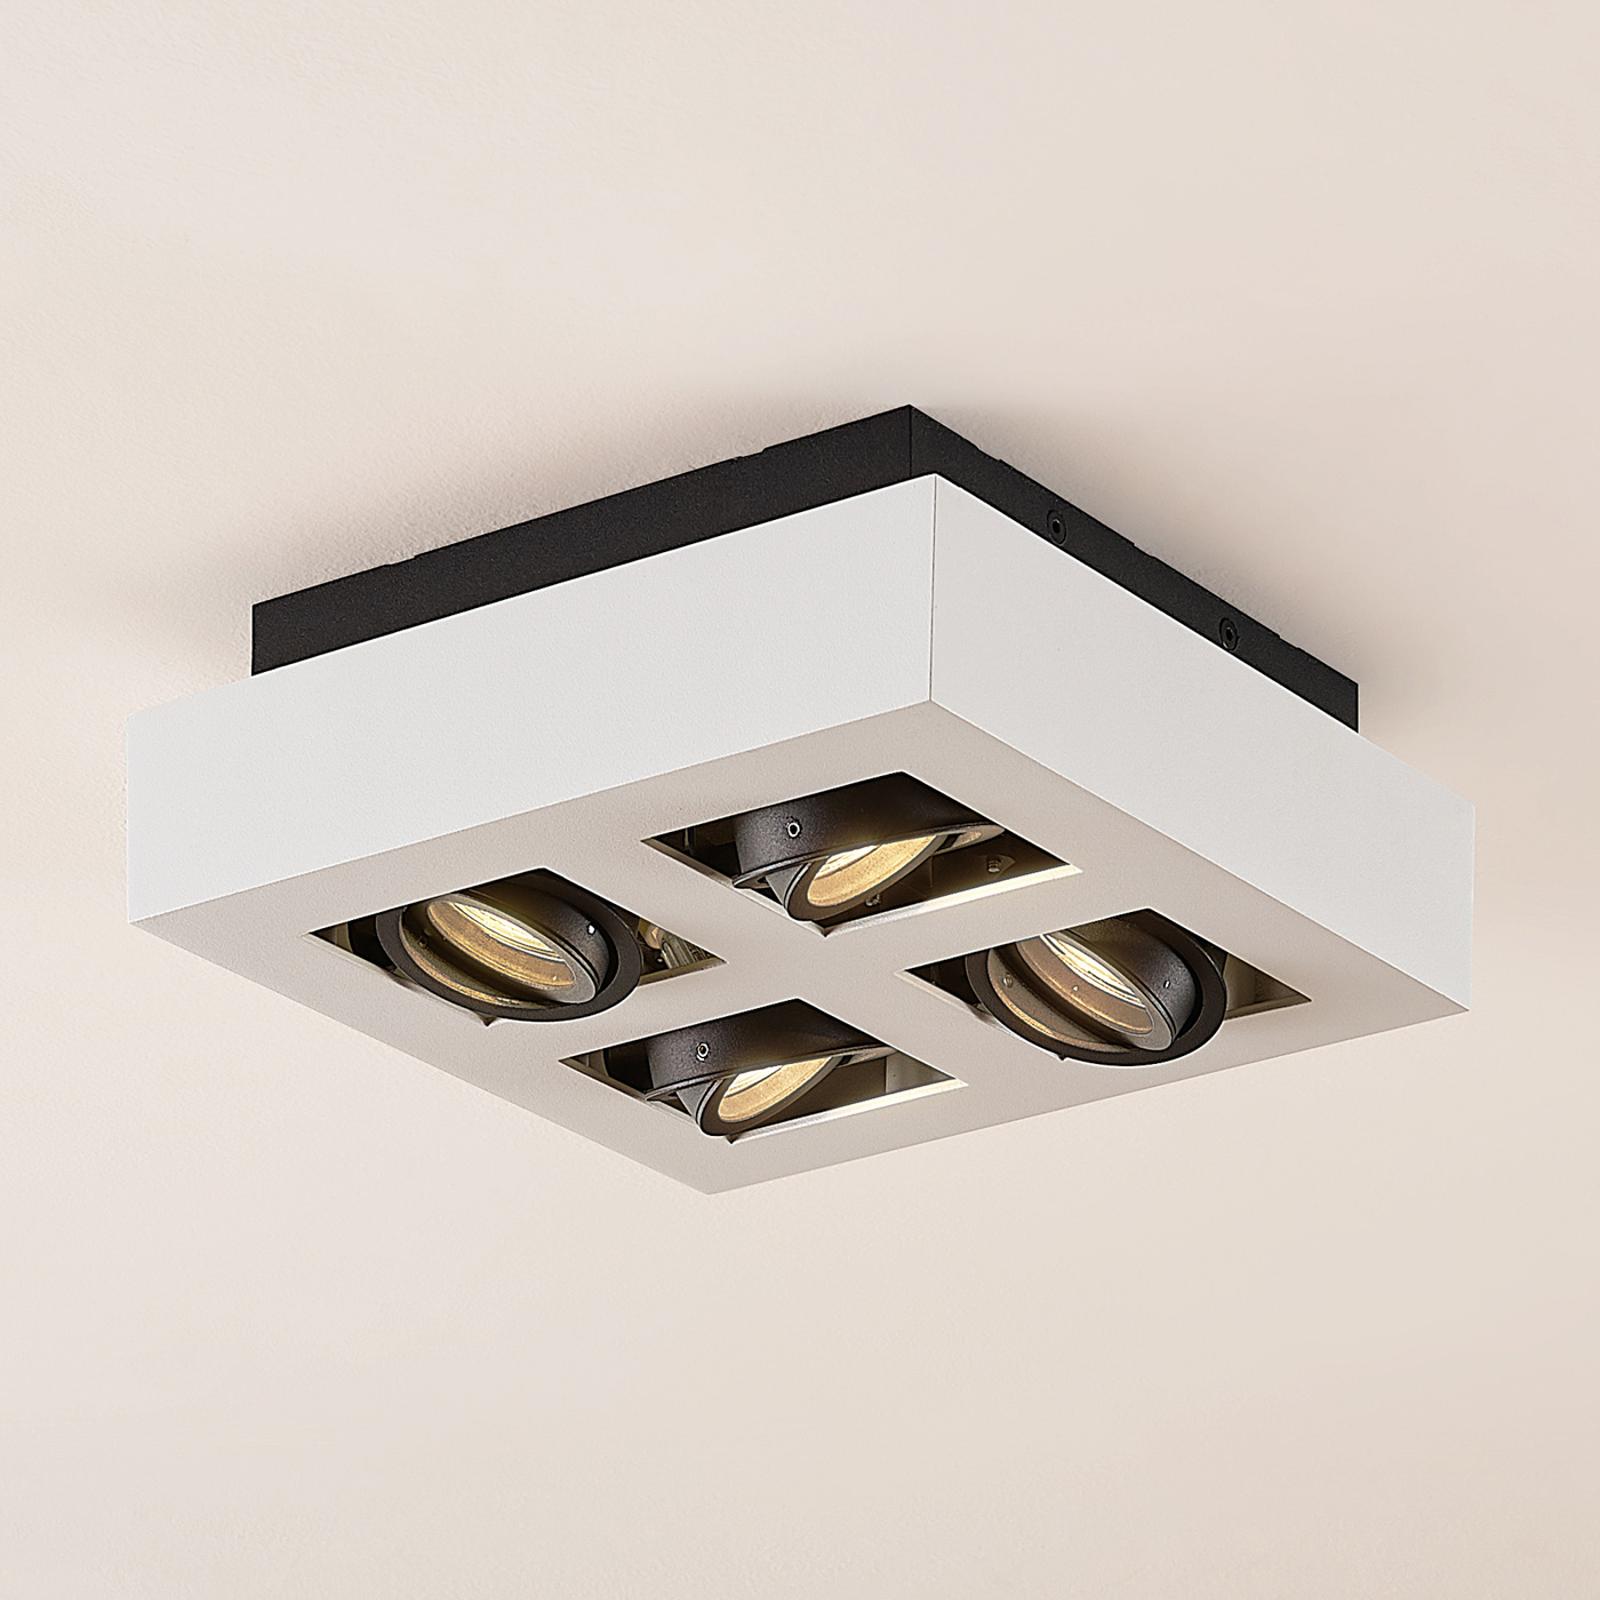 Arcchio Vince lampa sufitowa, 25 x 25 cm biała